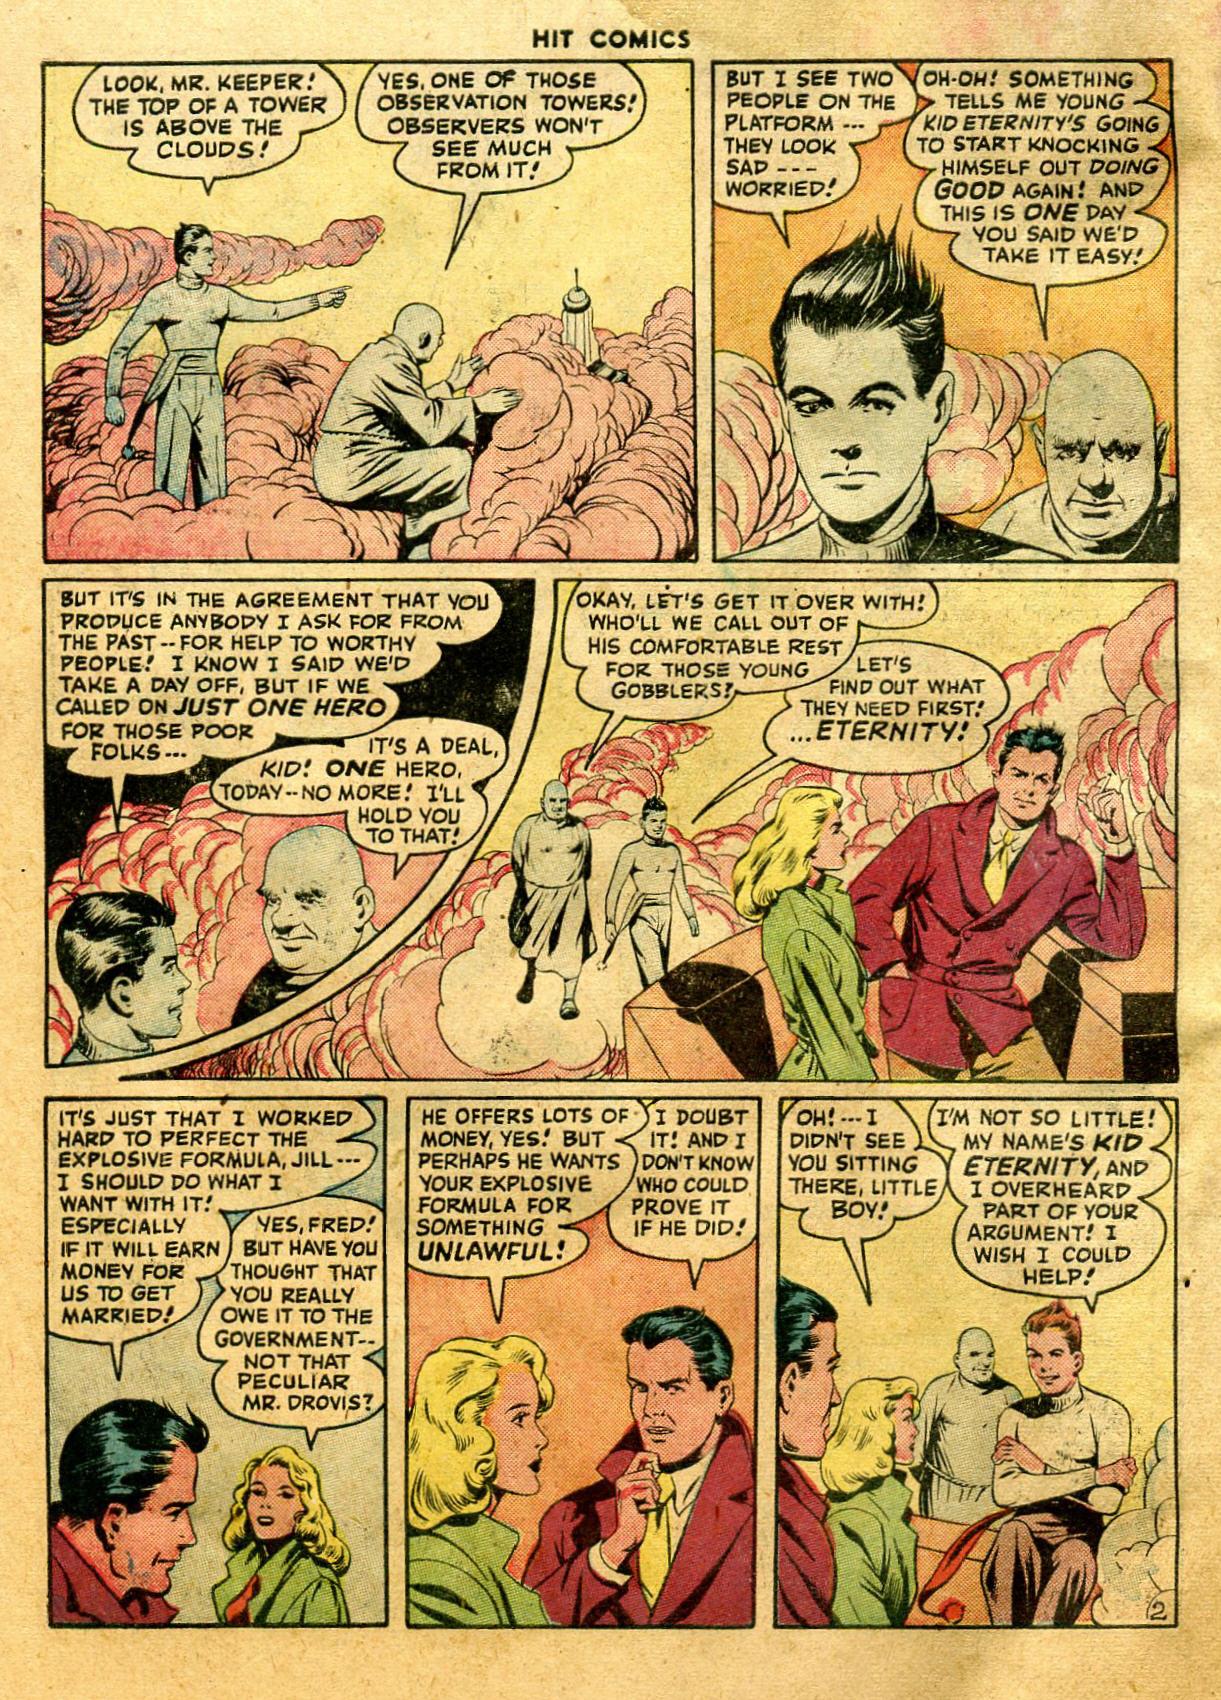 Read online Hit Comics comic -  Issue #44 - 4